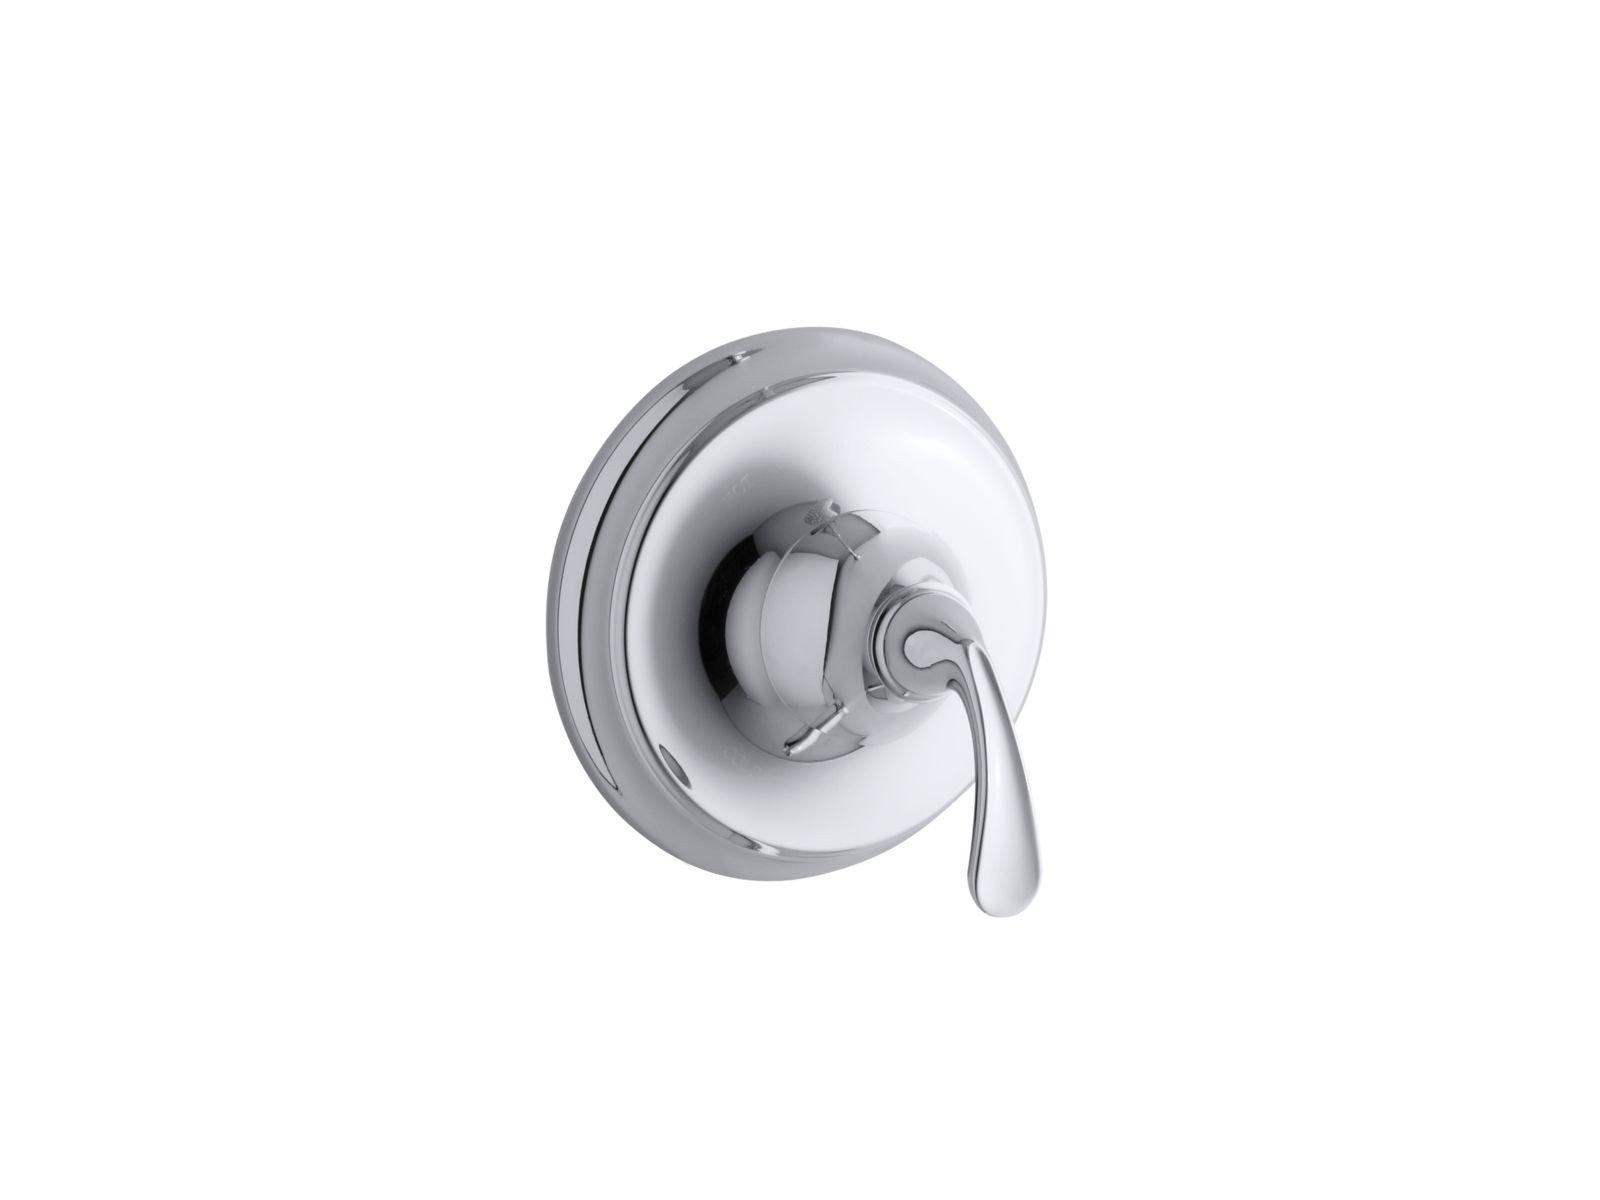 KOHLER TS10277-4-CP Forté(R) Sculpted Rite-Temp(R) valve trim by Kohler (Image #1)